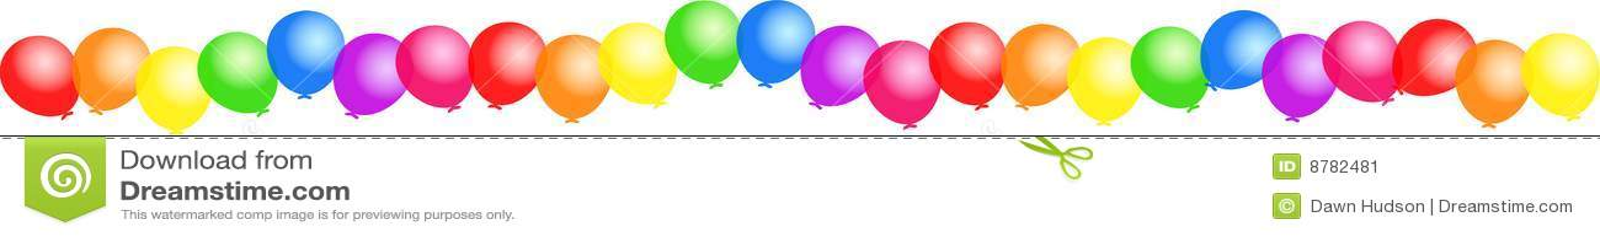 De grens van de ballon